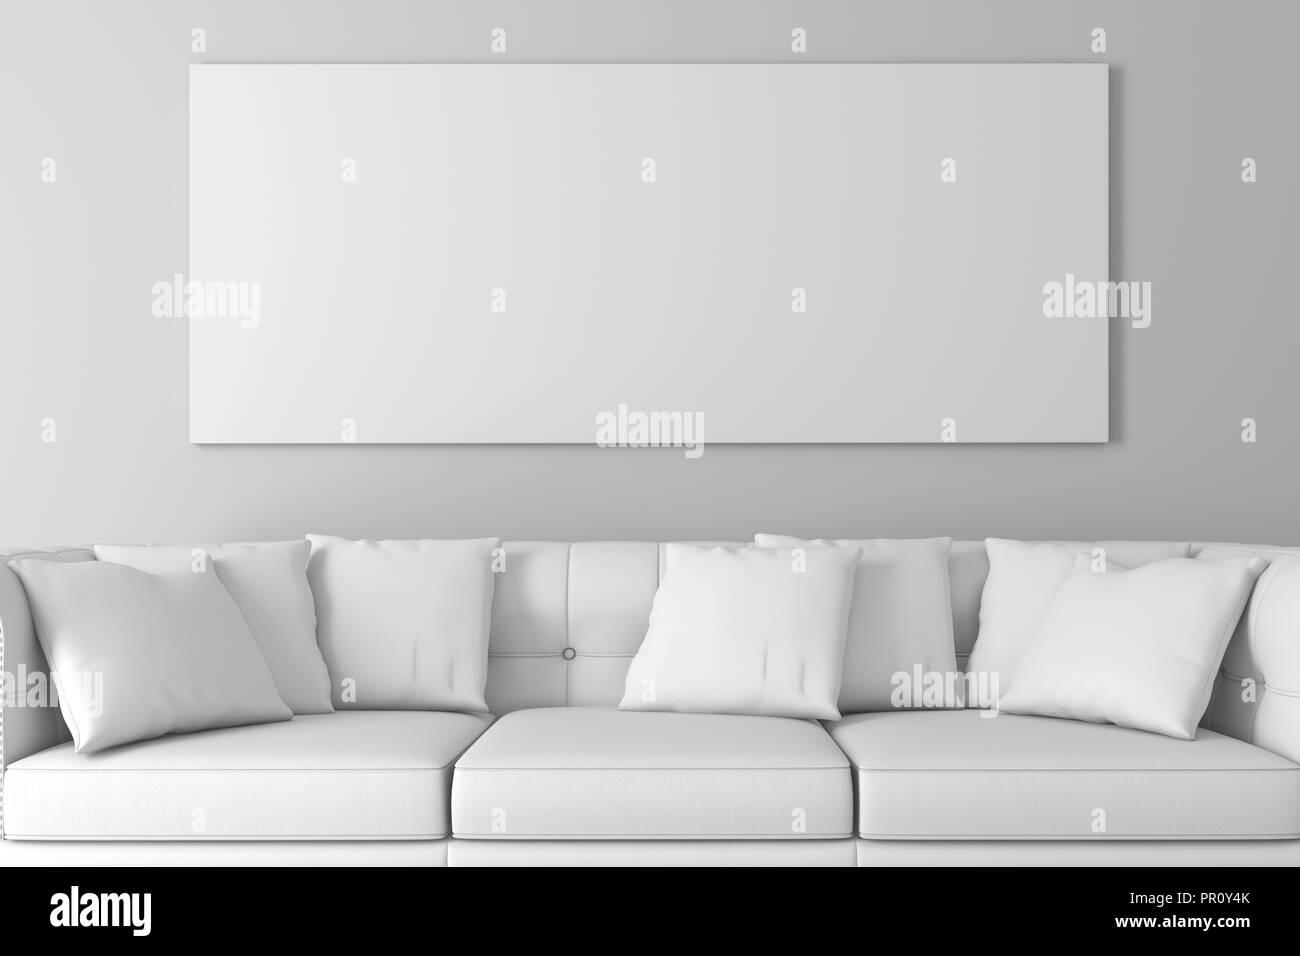 Incredible Photo Wall Sofa Interior Black And White Stock Photos Machost Co Dining Chair Design Ideas Machostcouk